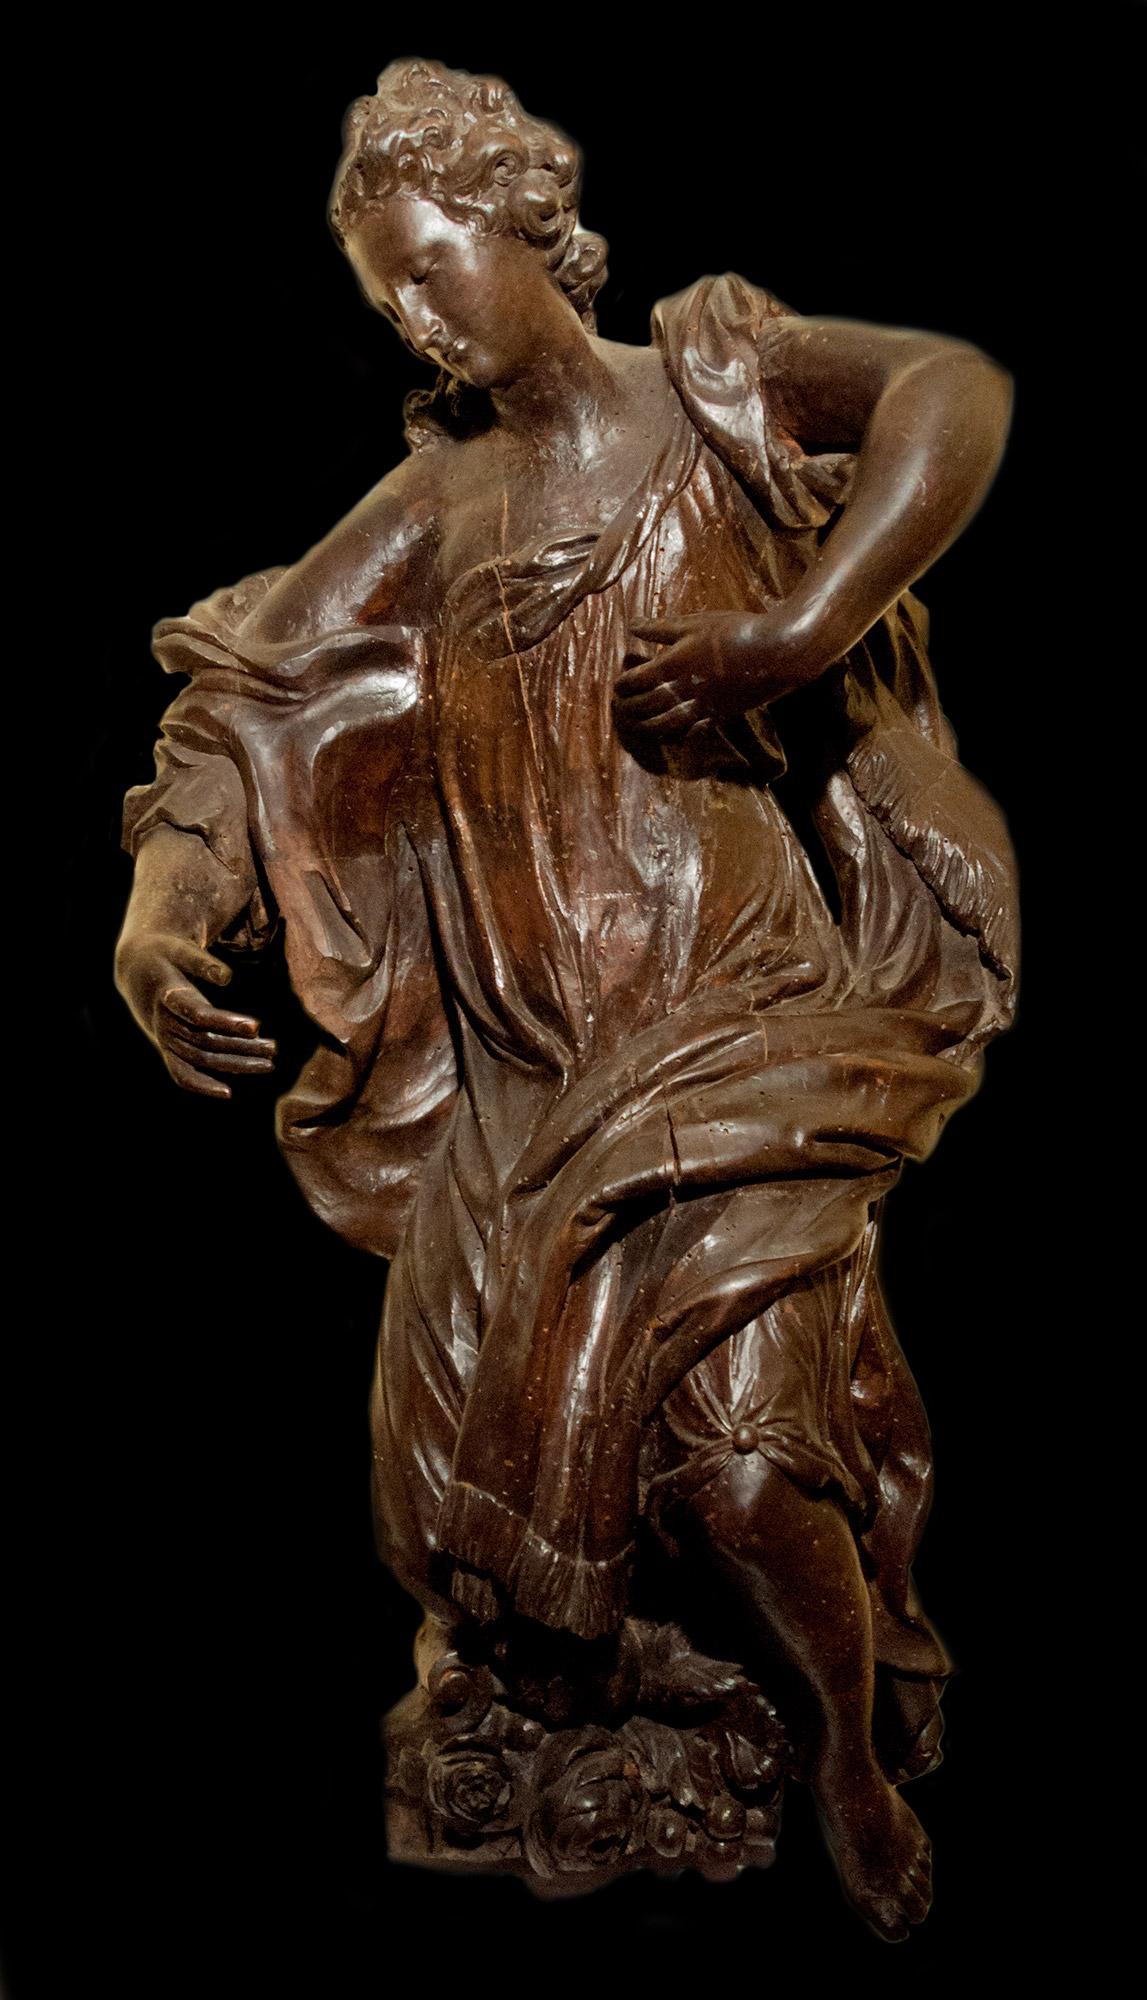 baroque art sculpture - photo #31